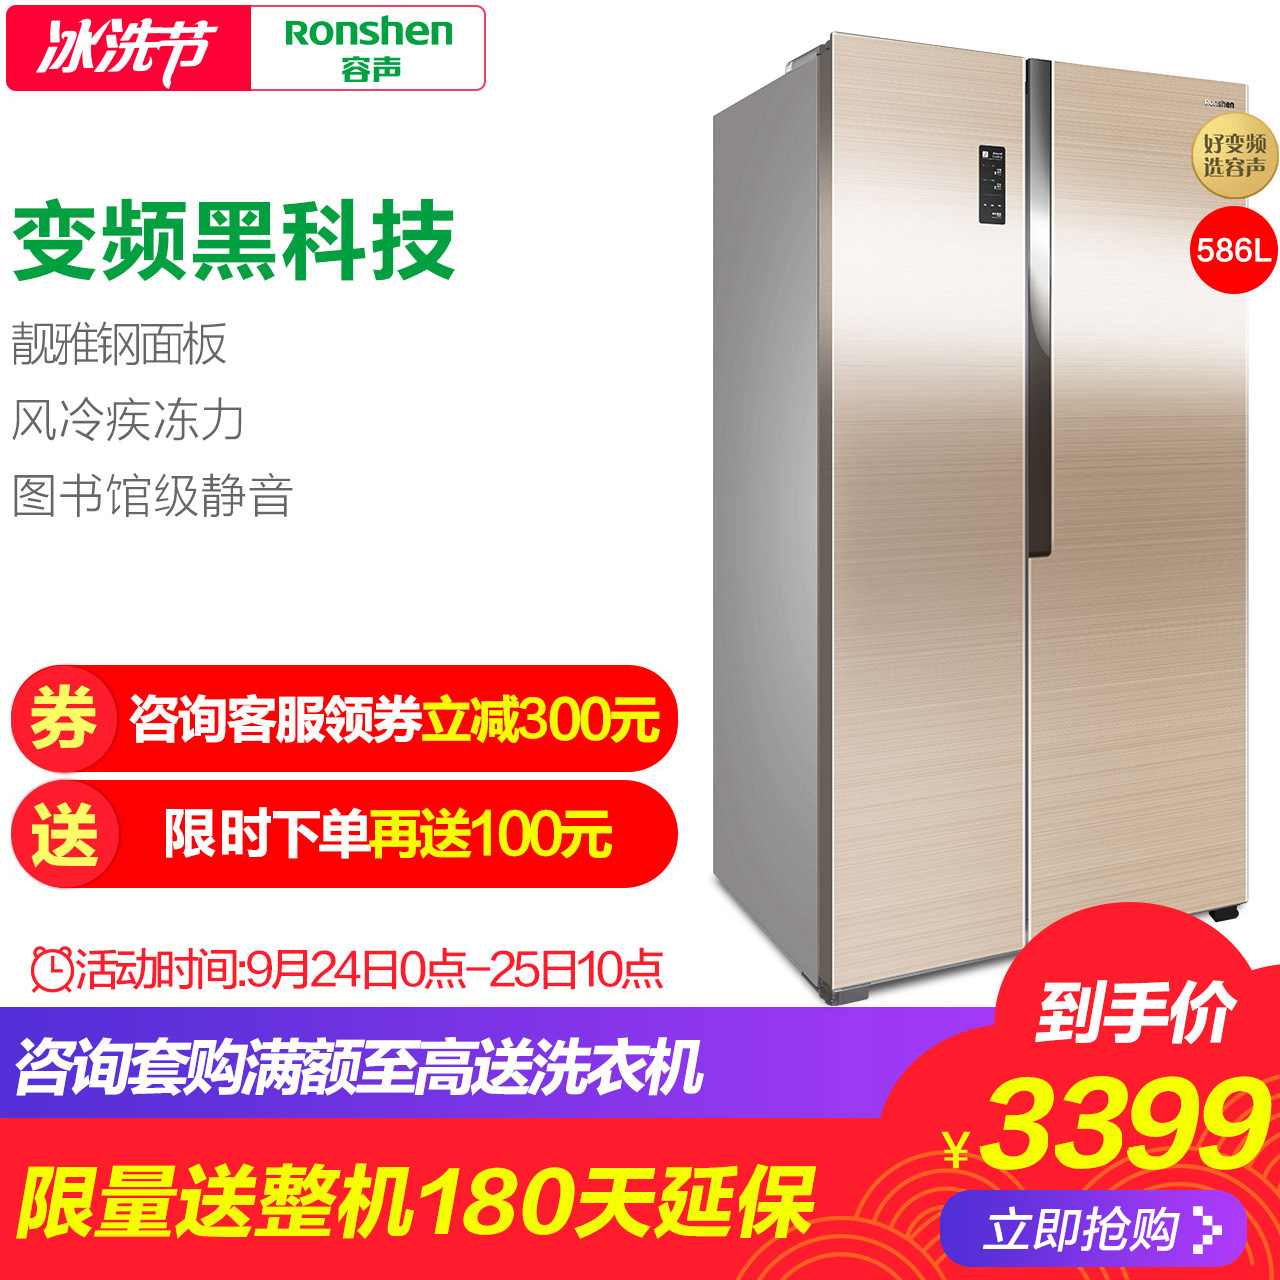 Ronshen-容声 BCD-586WD11HP 双开门冰箱对开门家用变频无霜